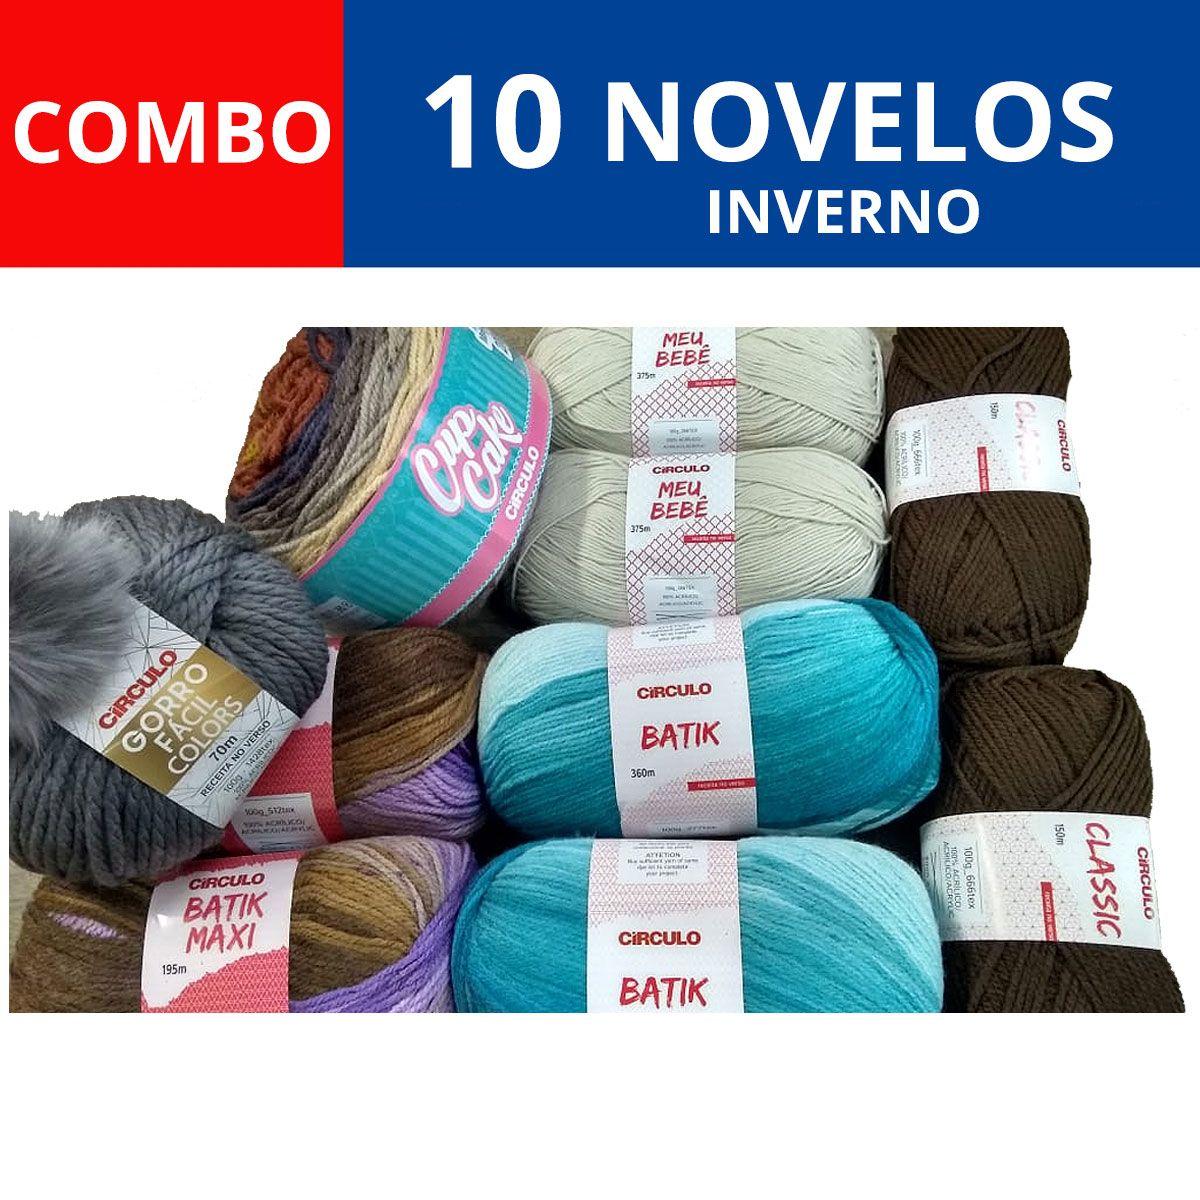 COMBO Novelos de Inverno 001